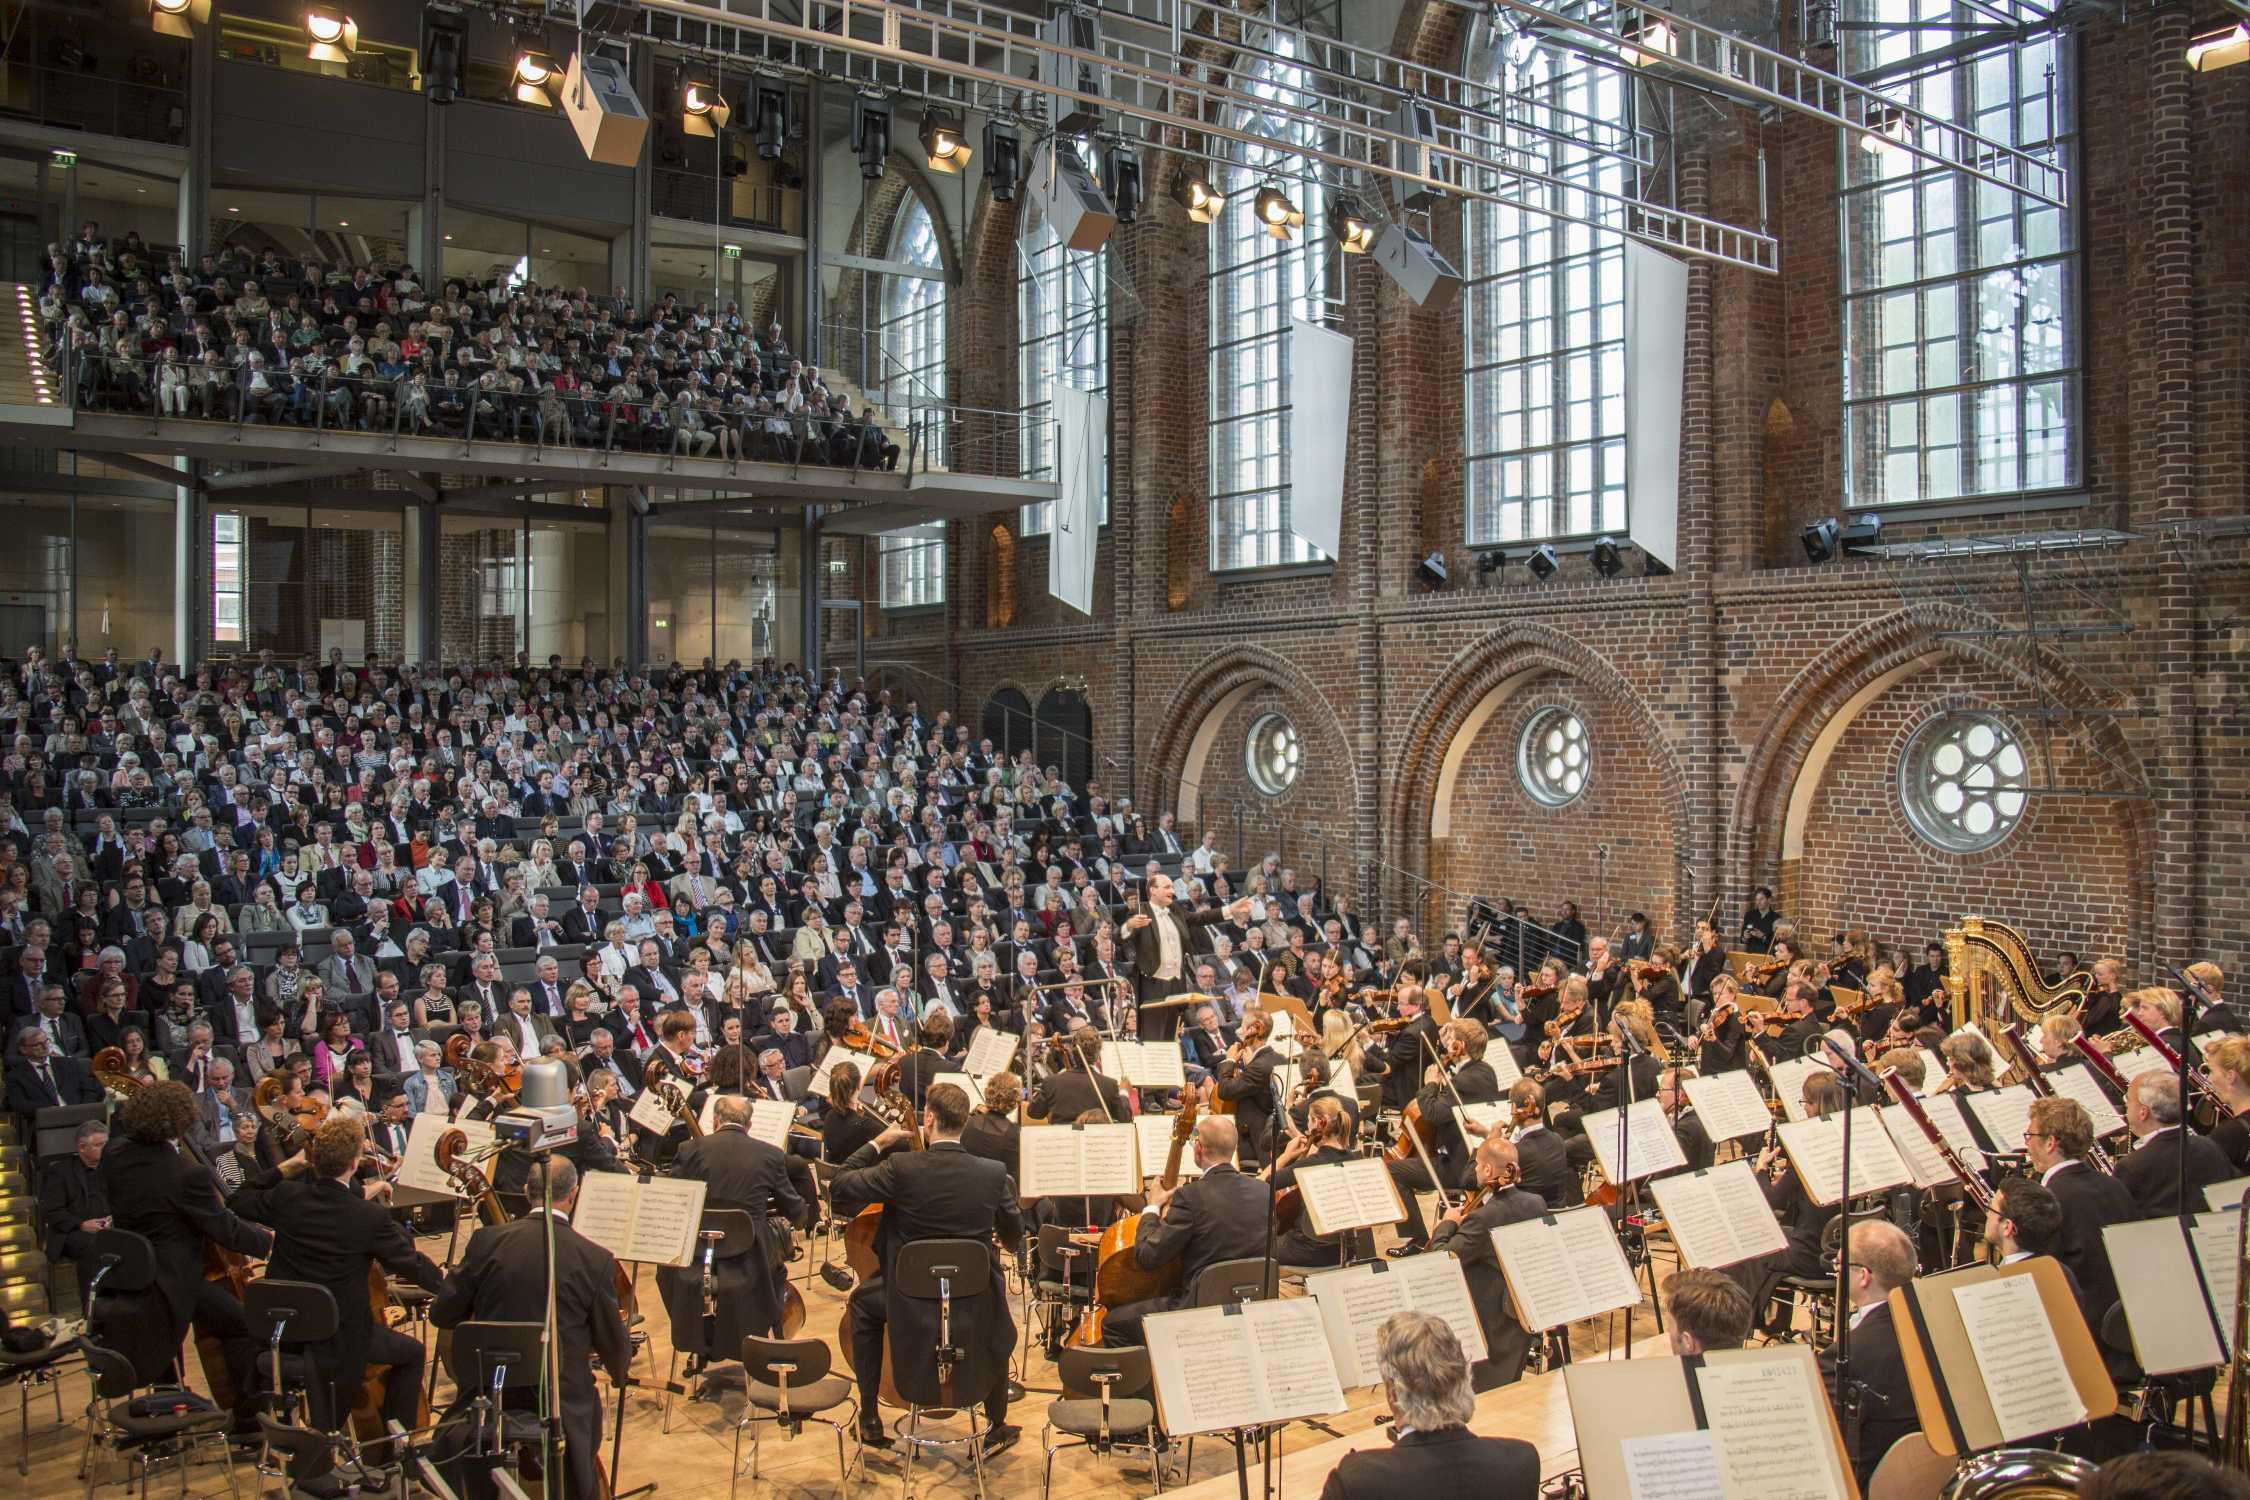 Mecklenburg Vorpommern Festspiele